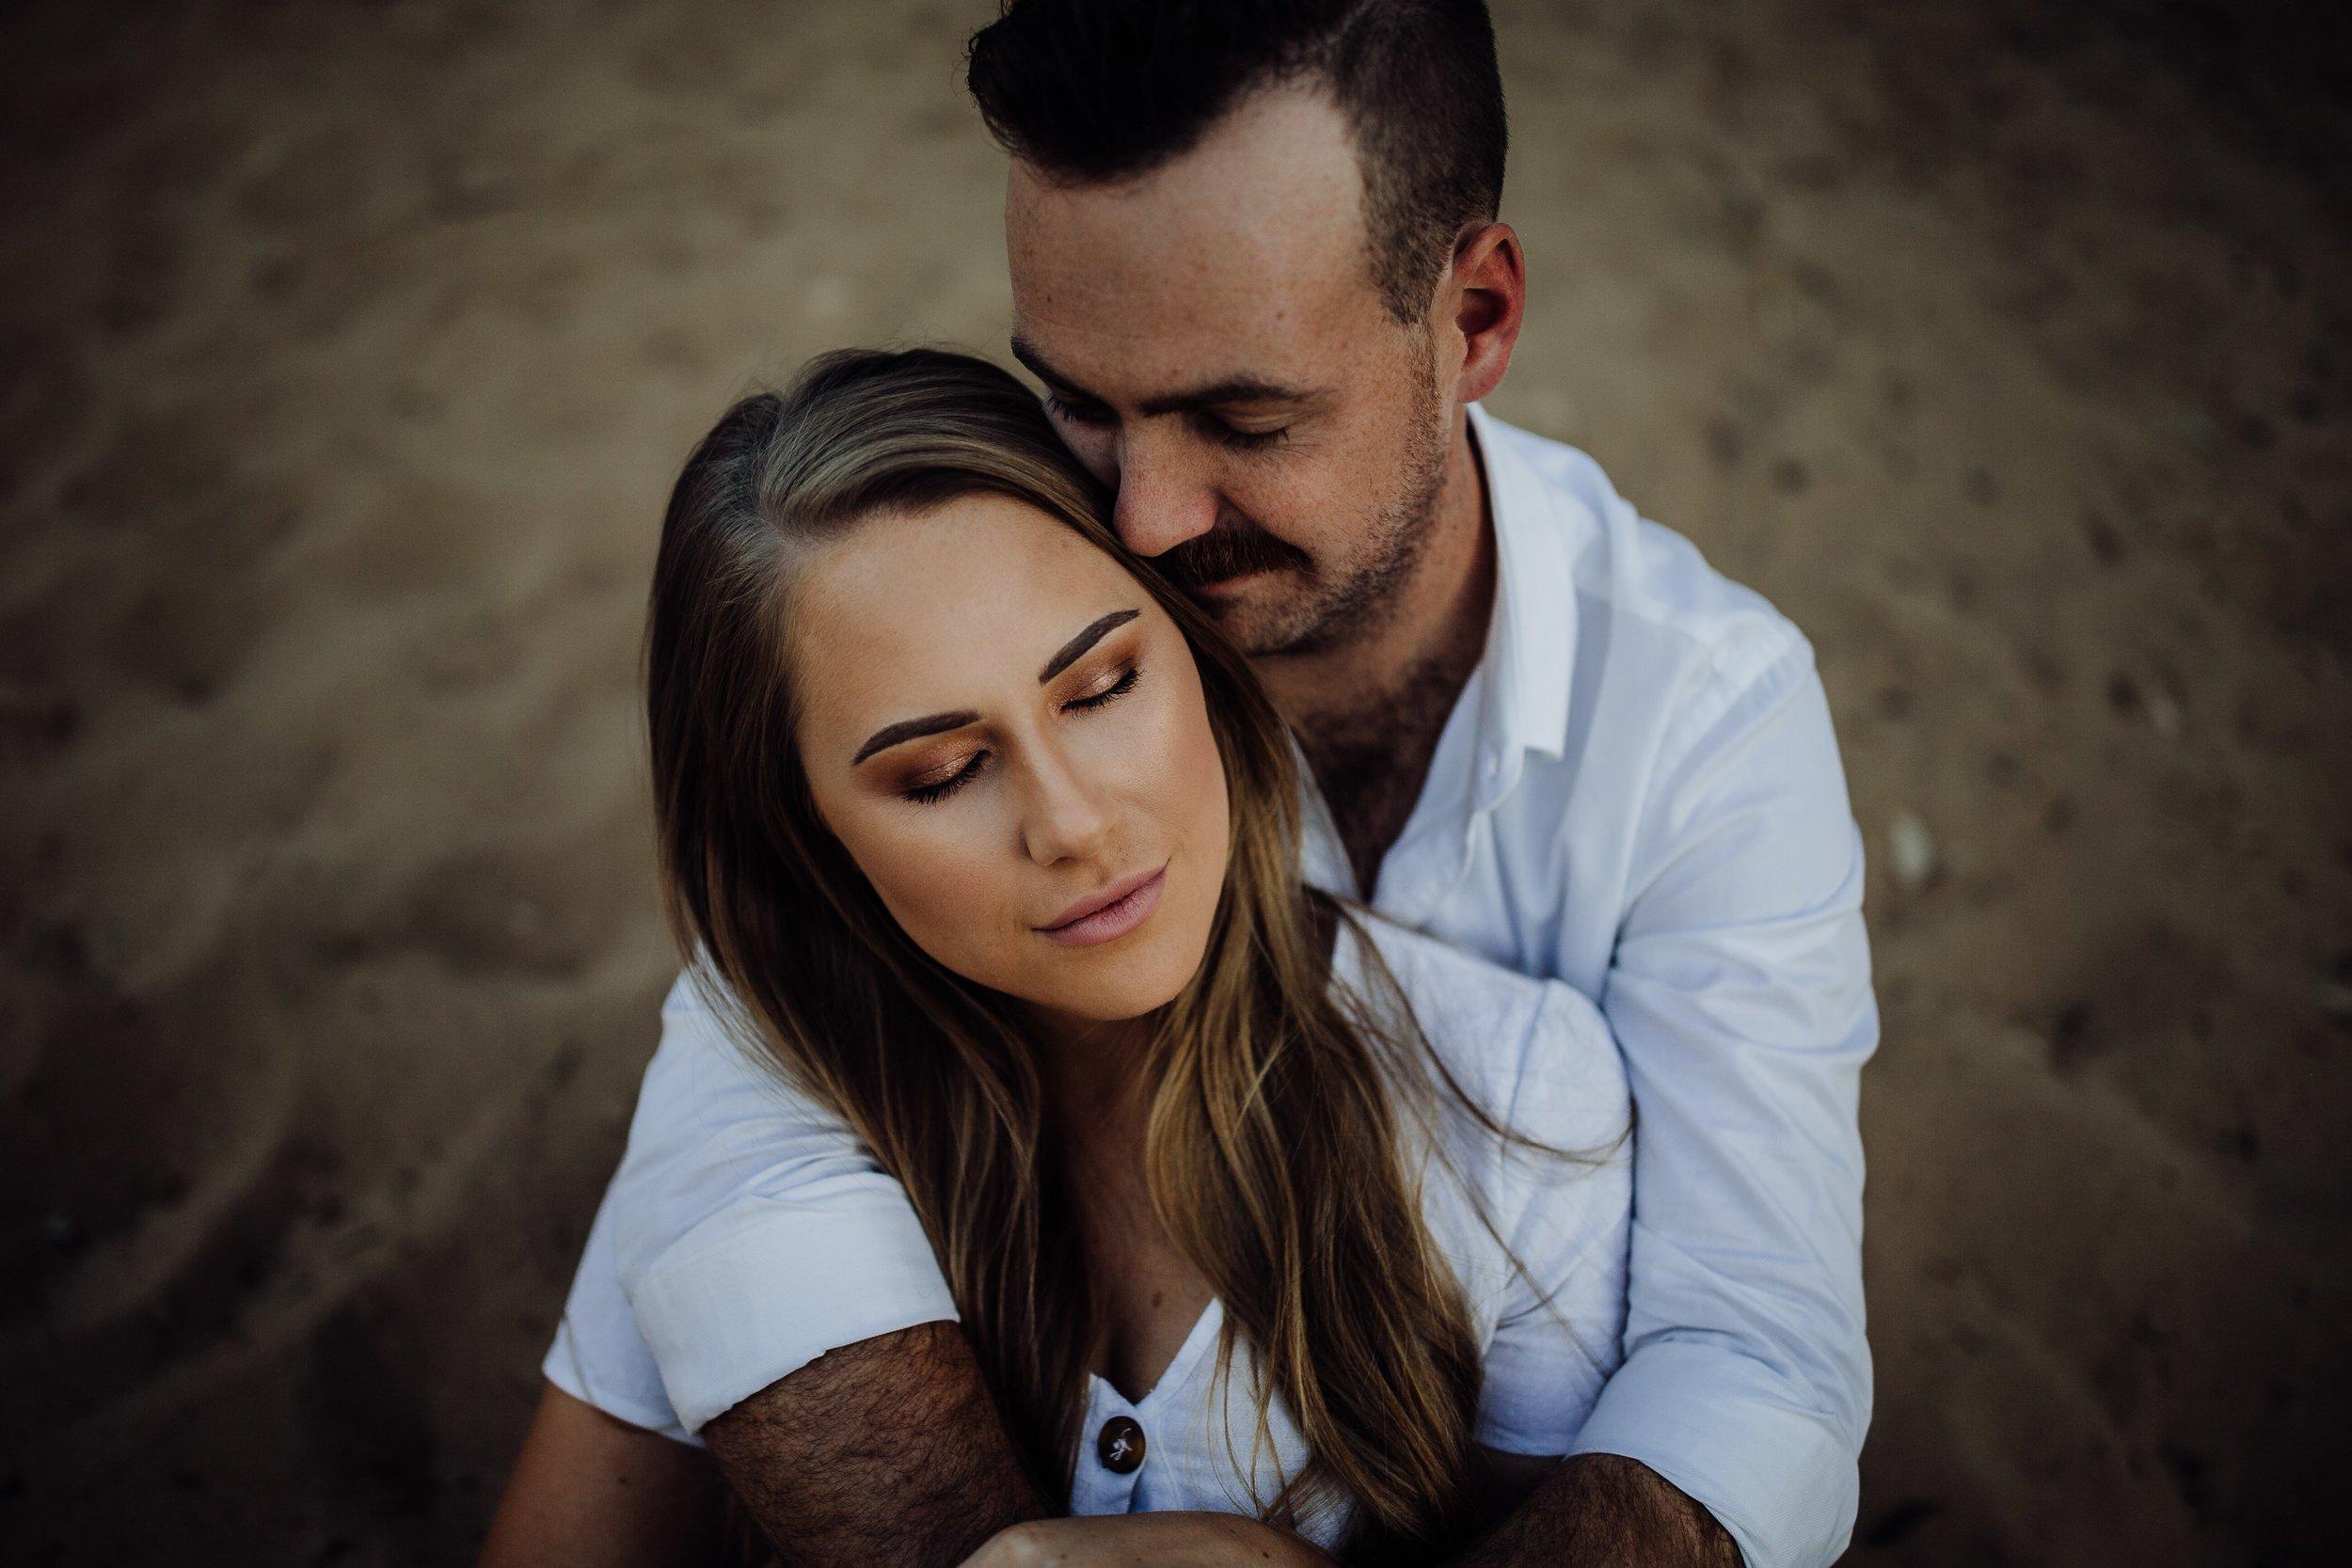 mickalathomas_puremacphotography_weddingphotographer_couplephotographer_Sheppartonphotographer_2850.jpg